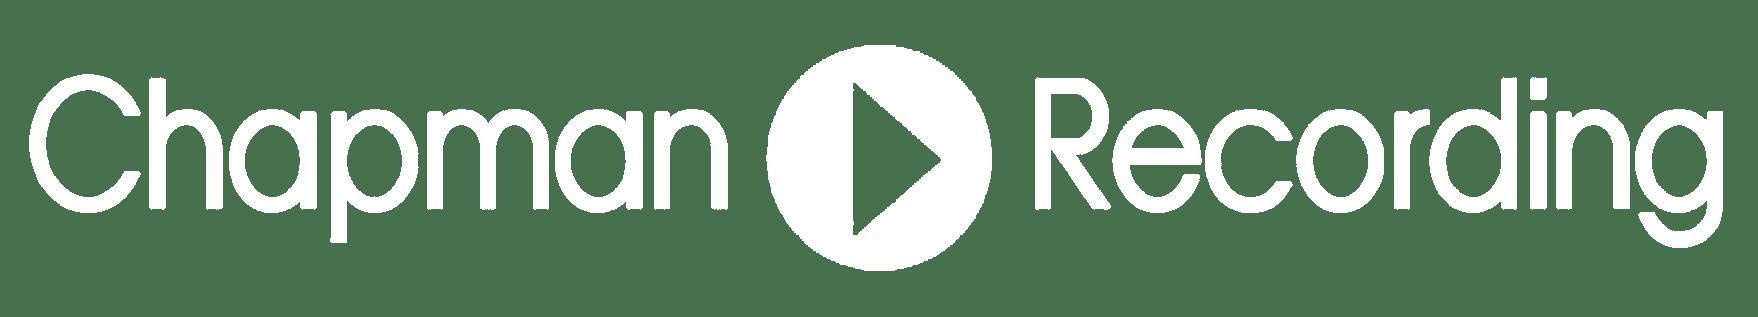 Chapman Recording logo